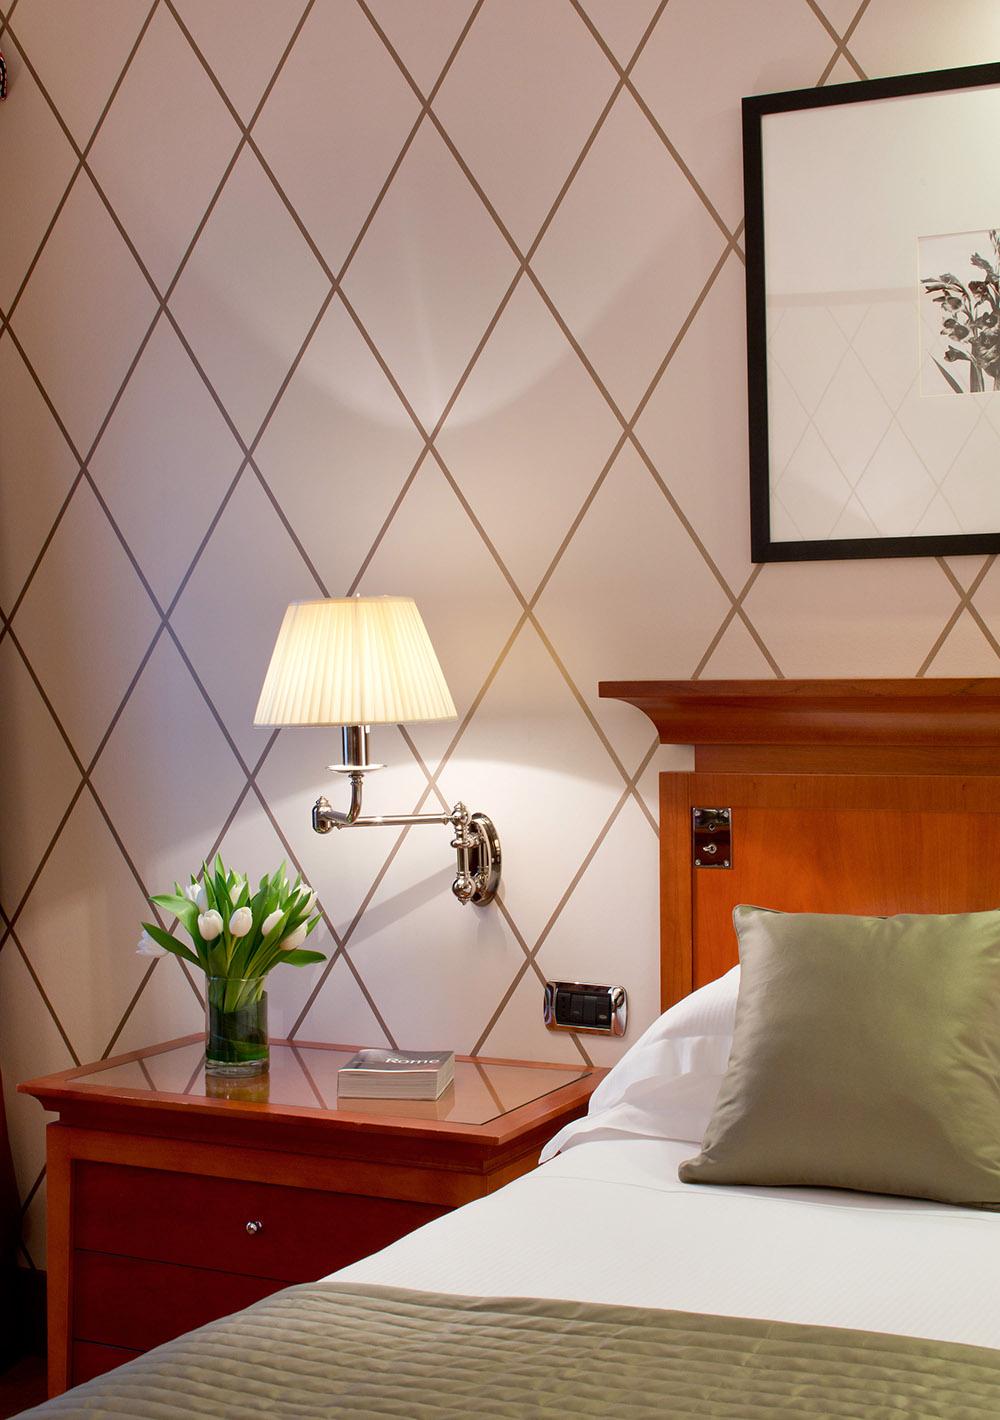 Starhotels Metropole a Roma: Stanza deluxe